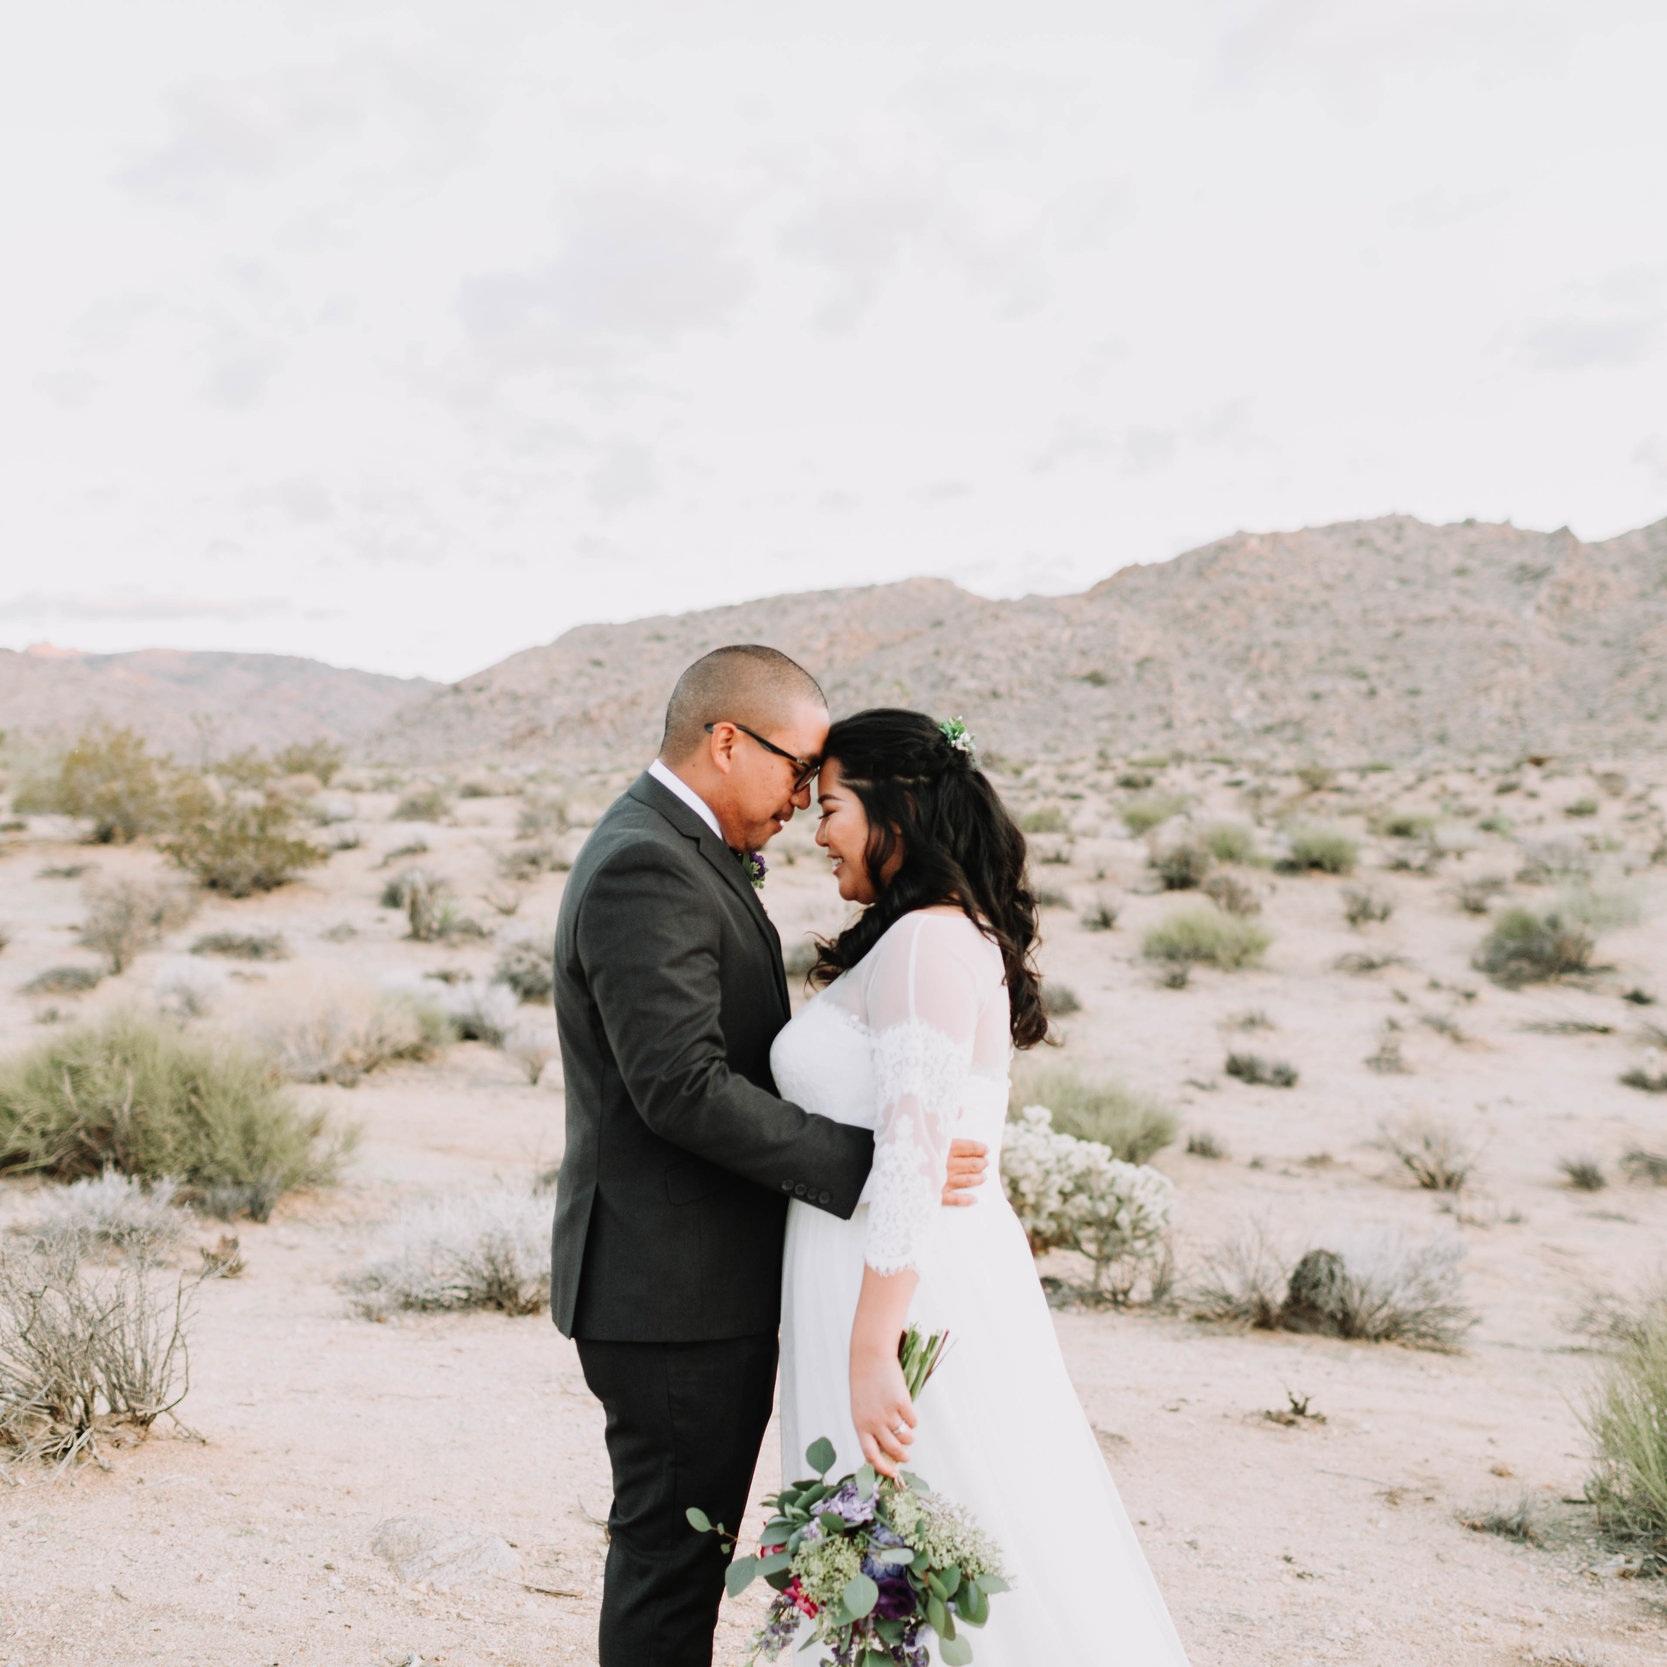 Jasmine + Wesley | Wedding | Joshua Tree Sacred Sands, CA